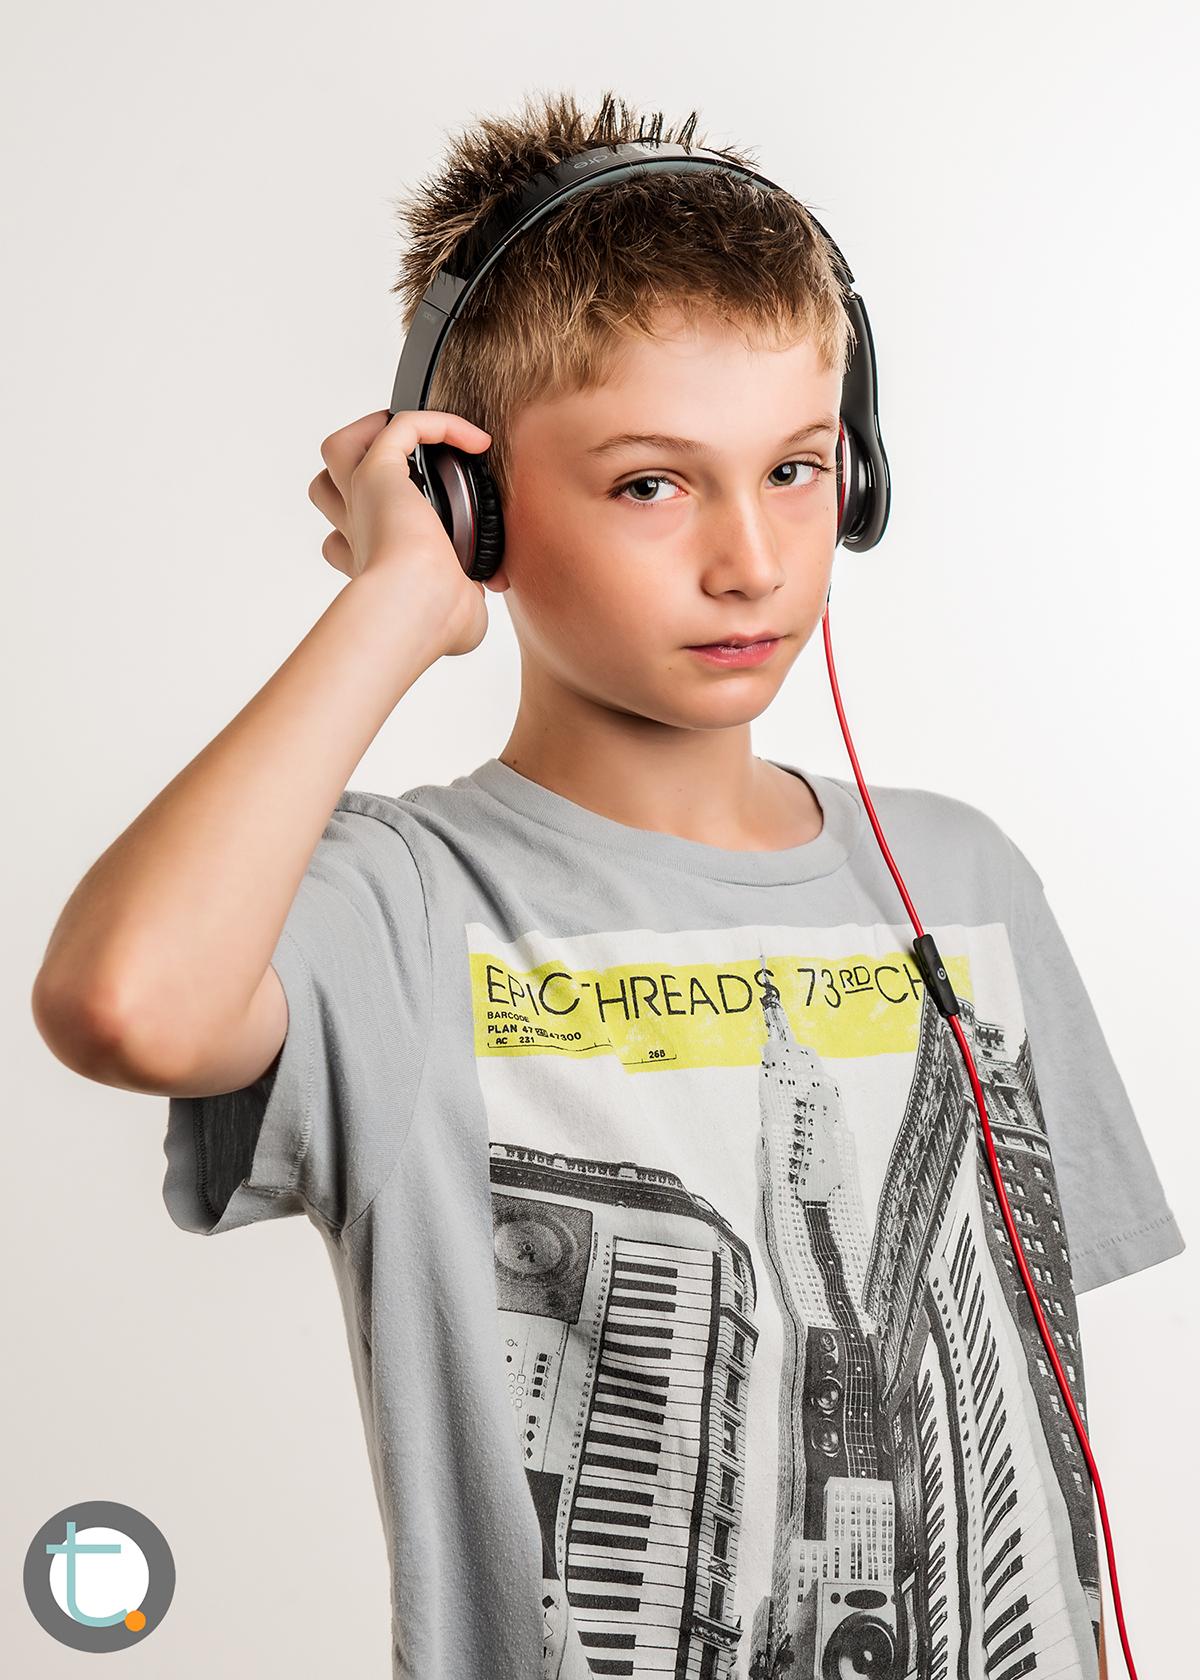 studio_kid_headphones_tracyallynphotography_tween_beats_005.jpg